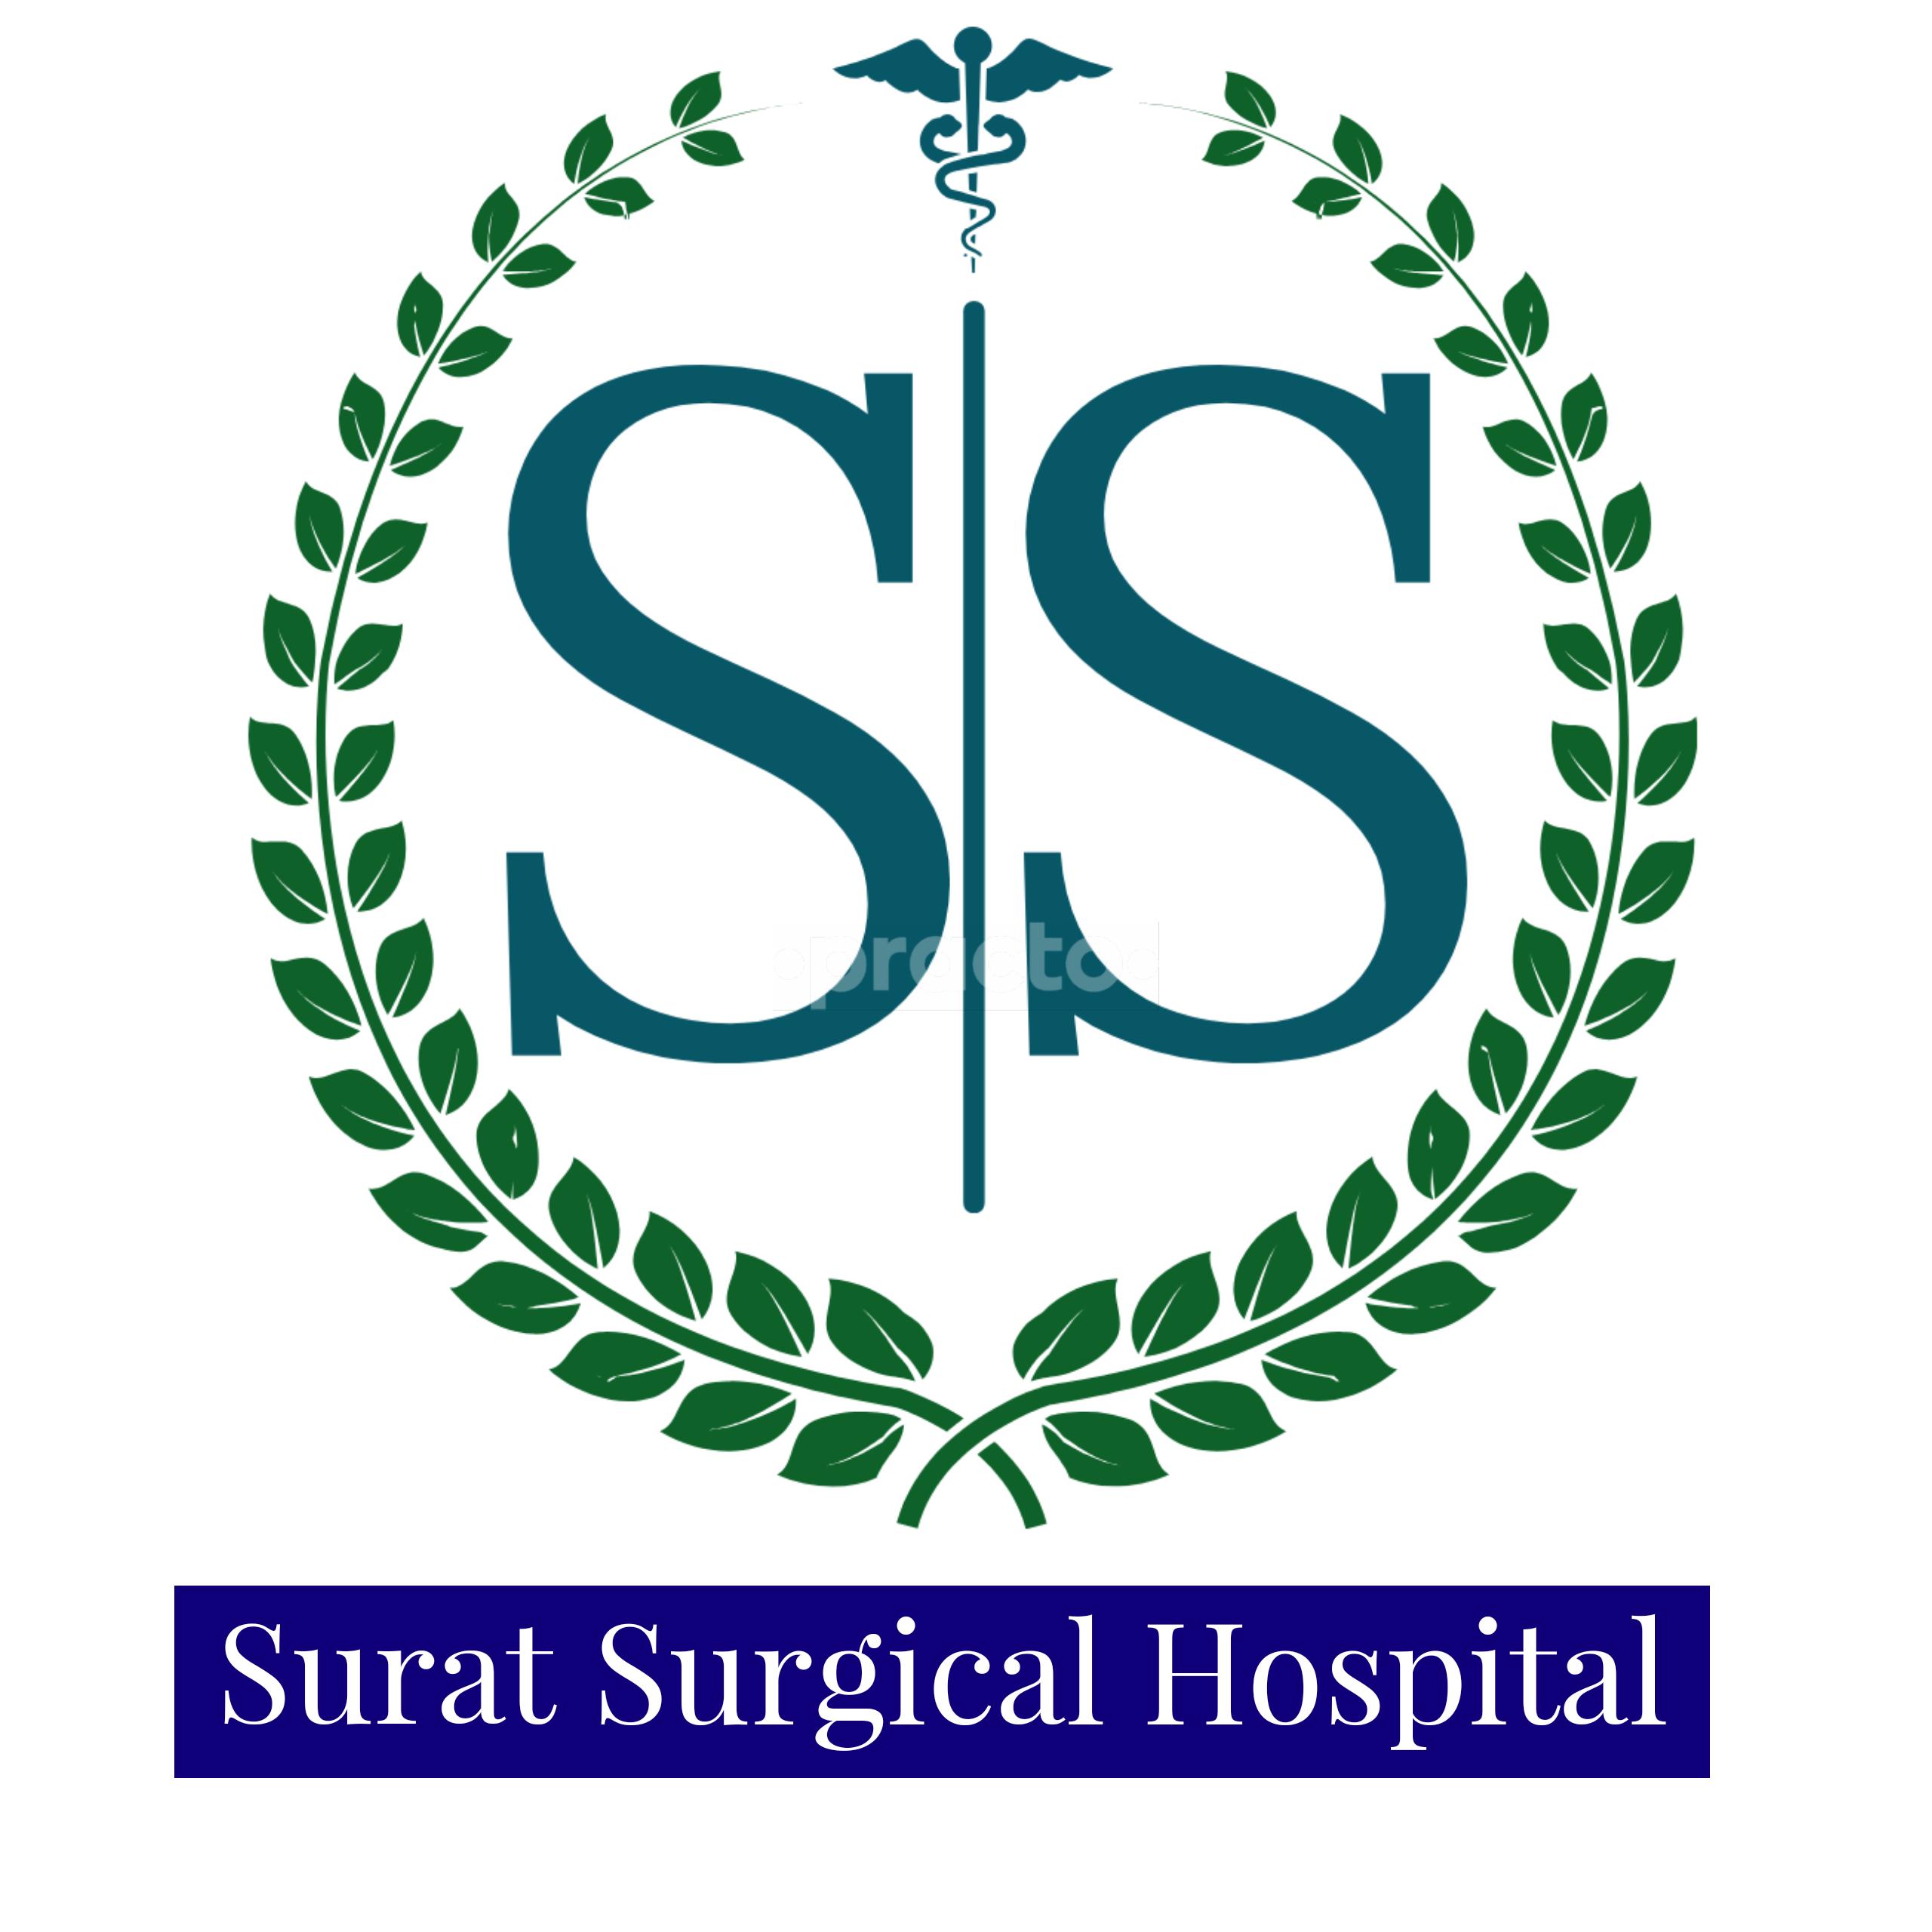 Surat Surgical Hospital